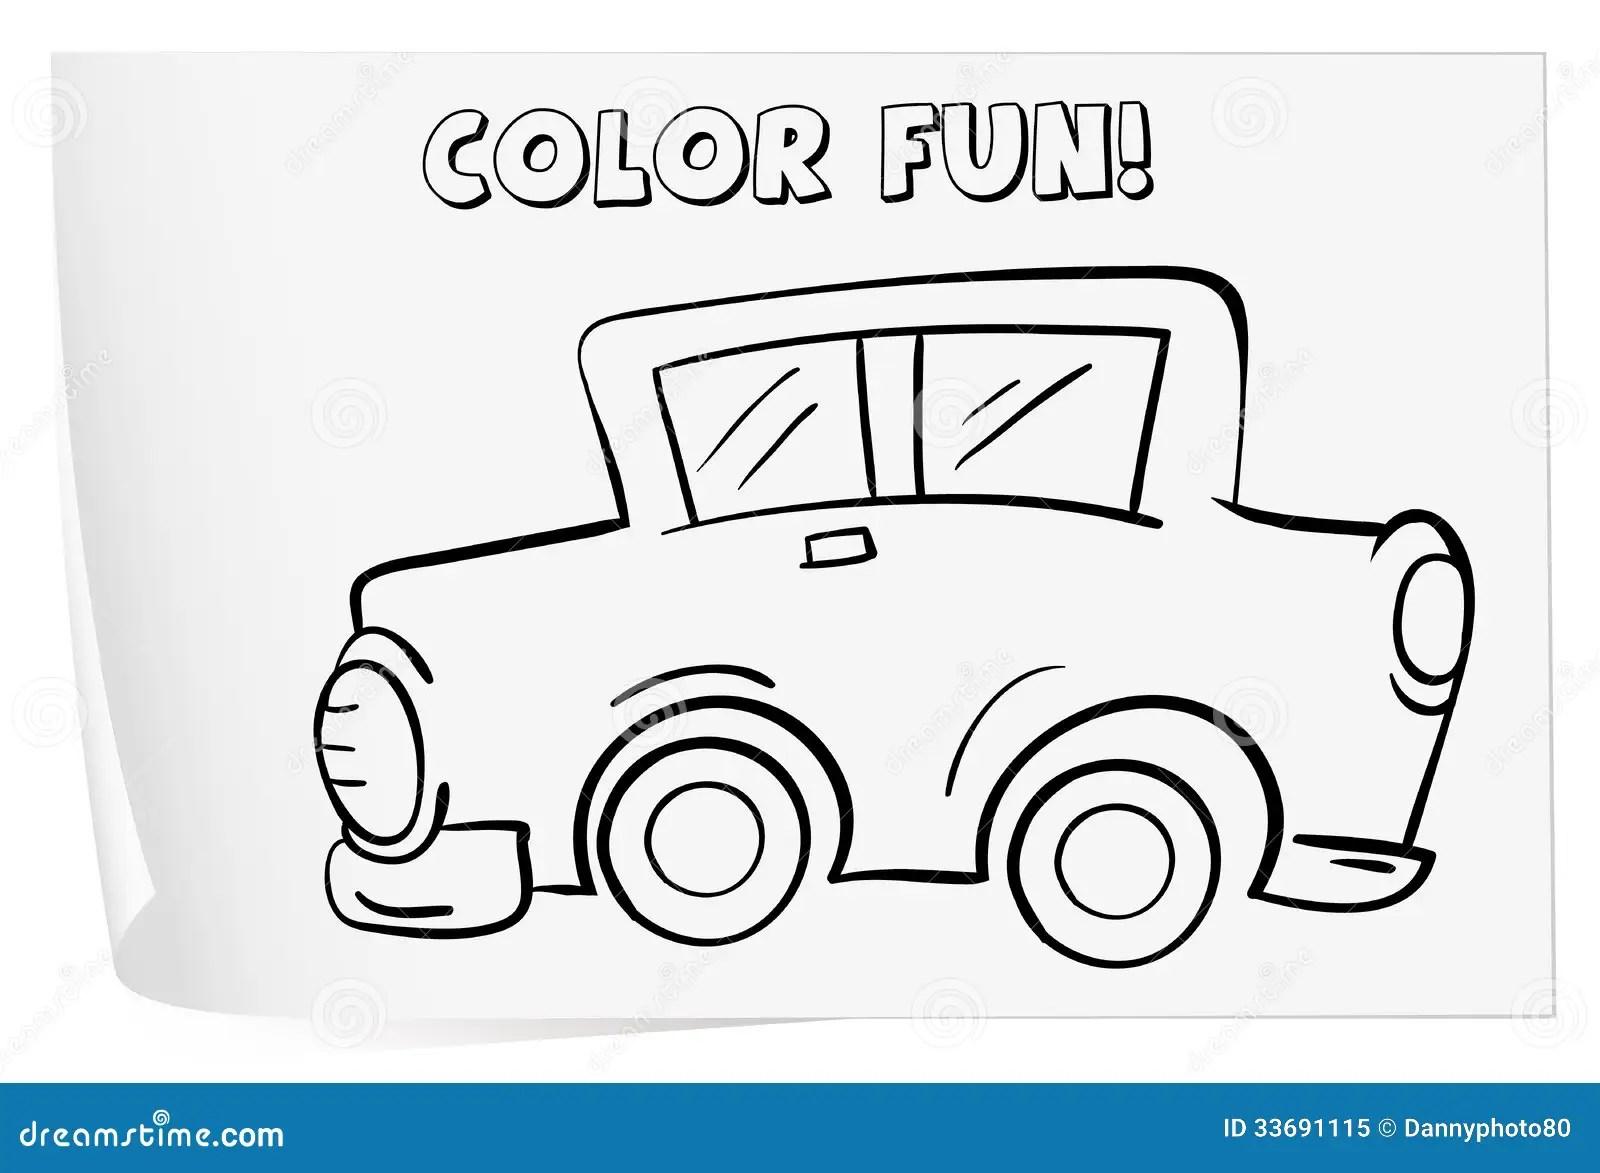 Coloring Worksheet Royalty Free Stock Photo